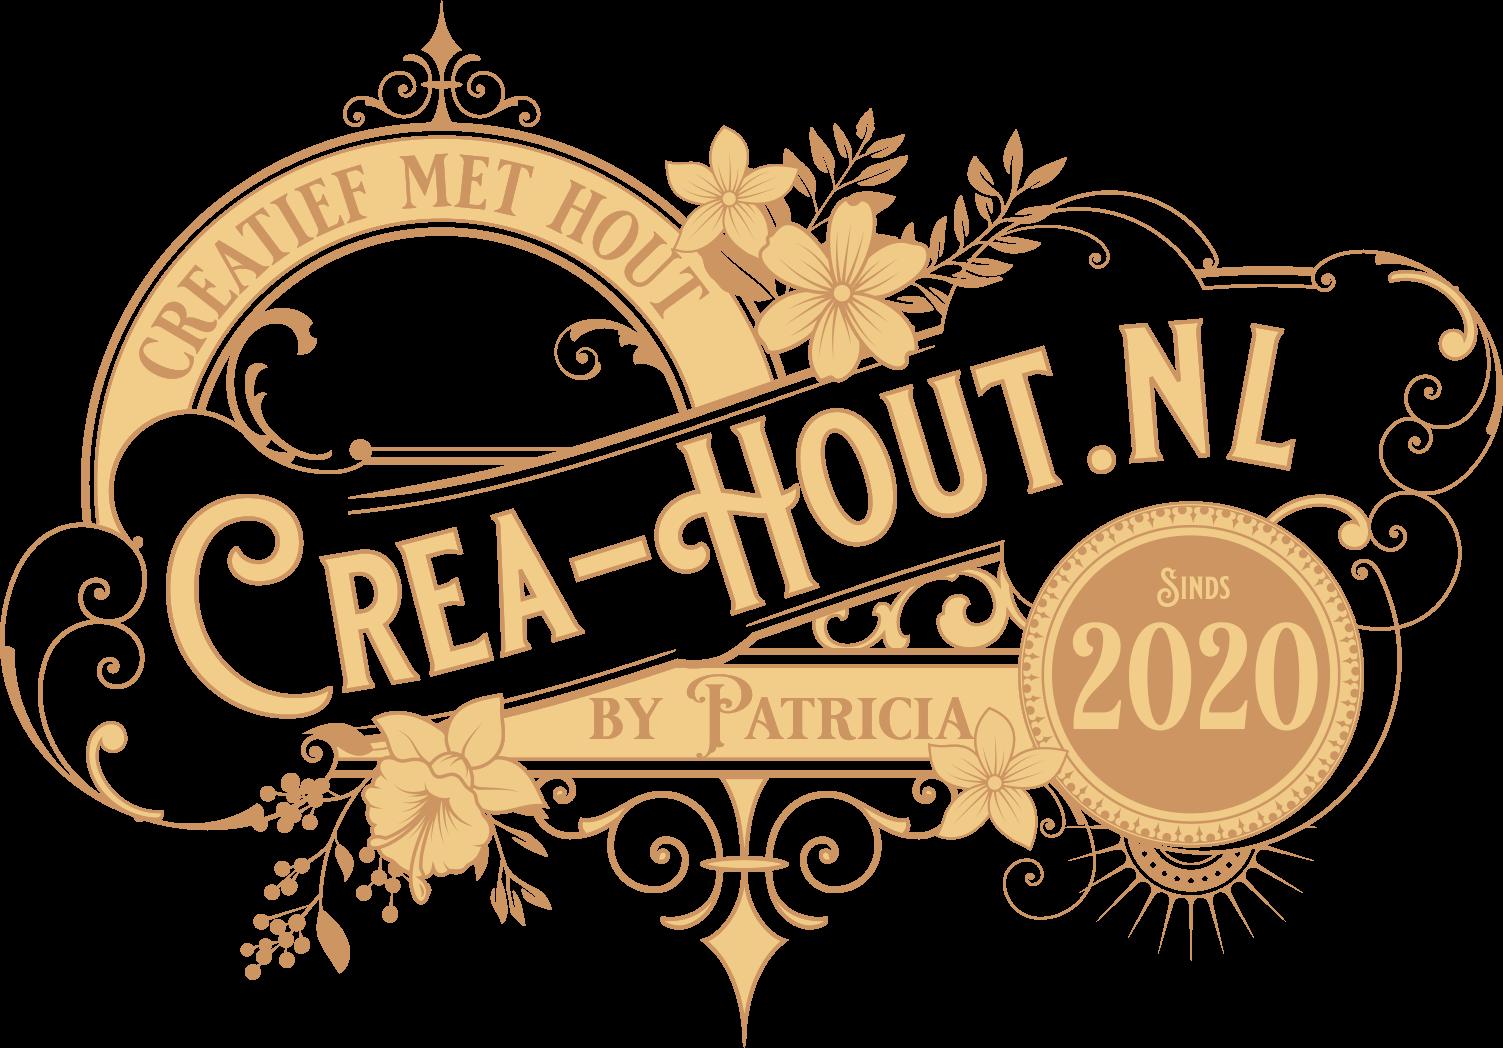 Crea-Hout